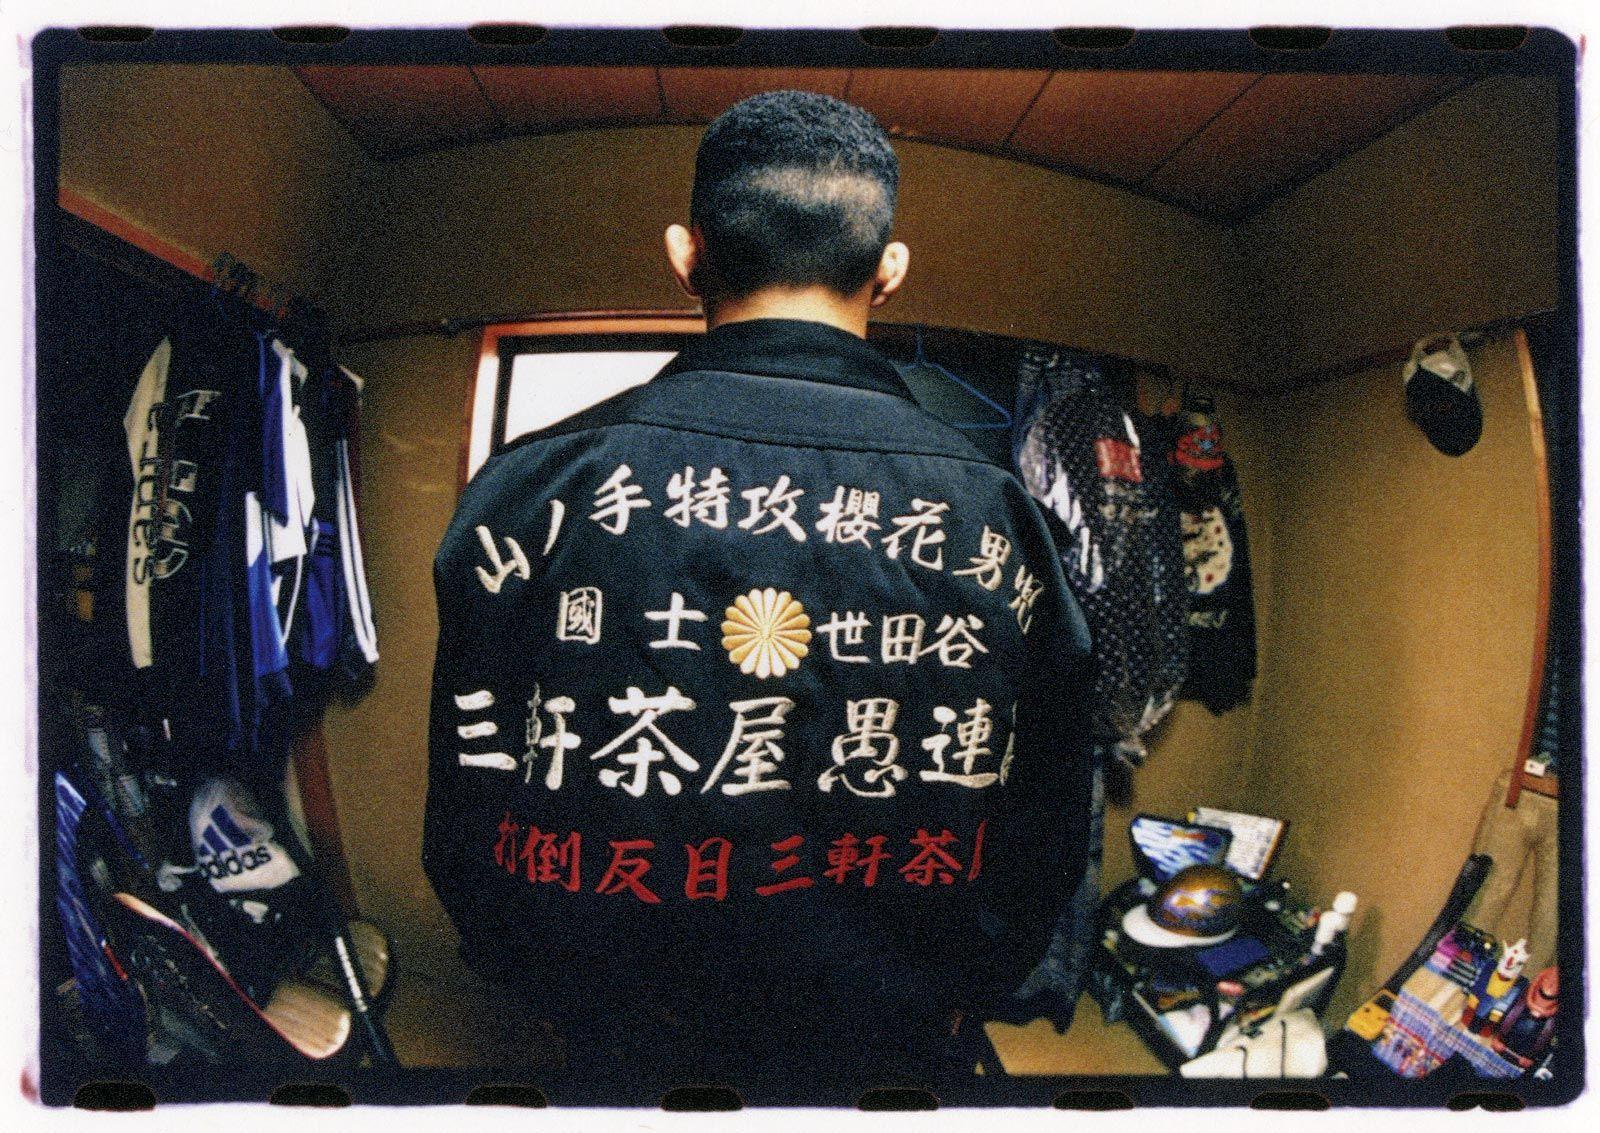 bosozoku-the-stylish-legacy-of-japans-rebel-motorcycle-gangs-8